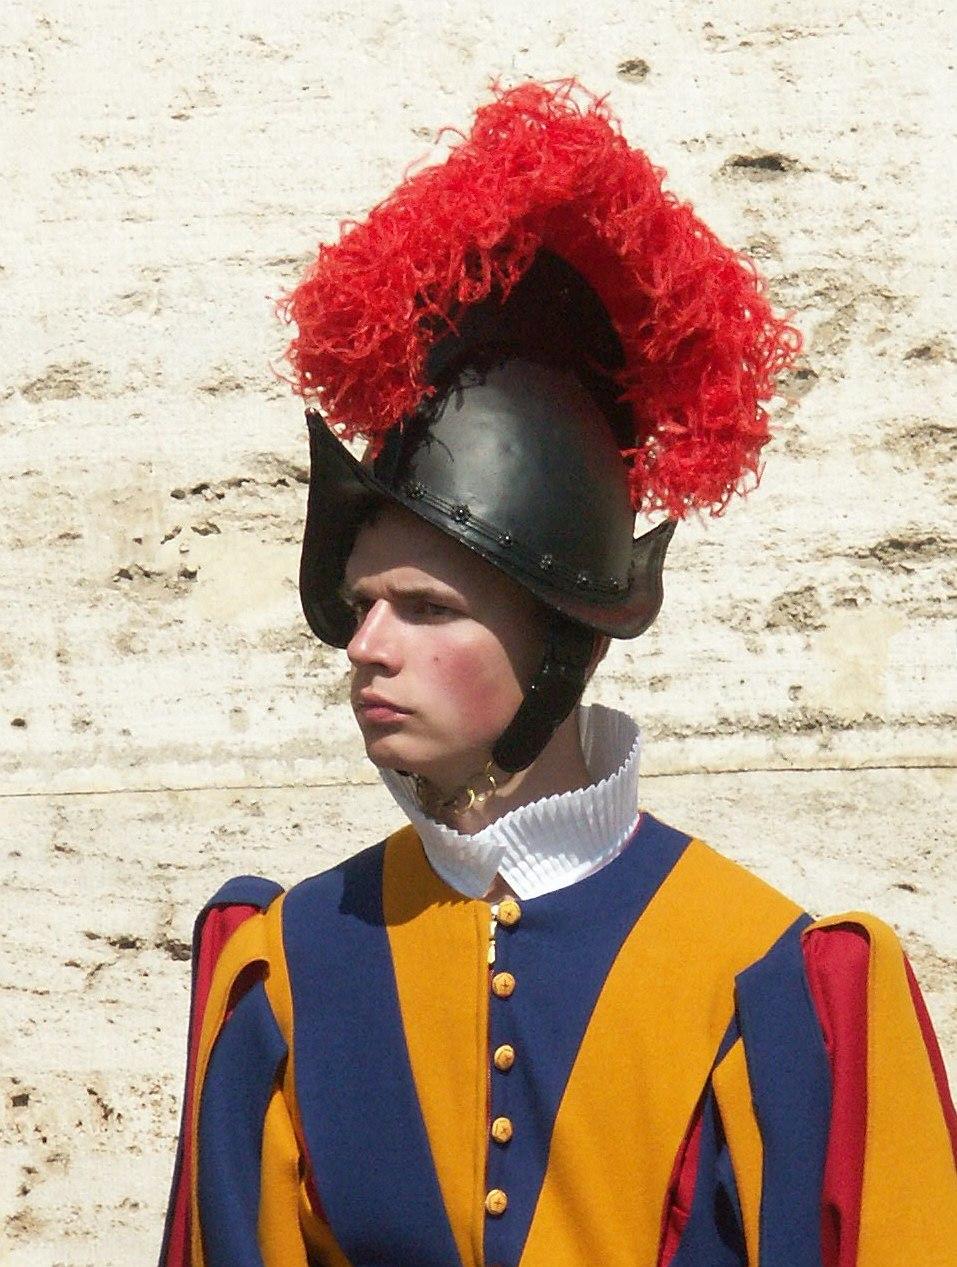 Rom, Vatikan, Soldat der Schweizer Garde 2